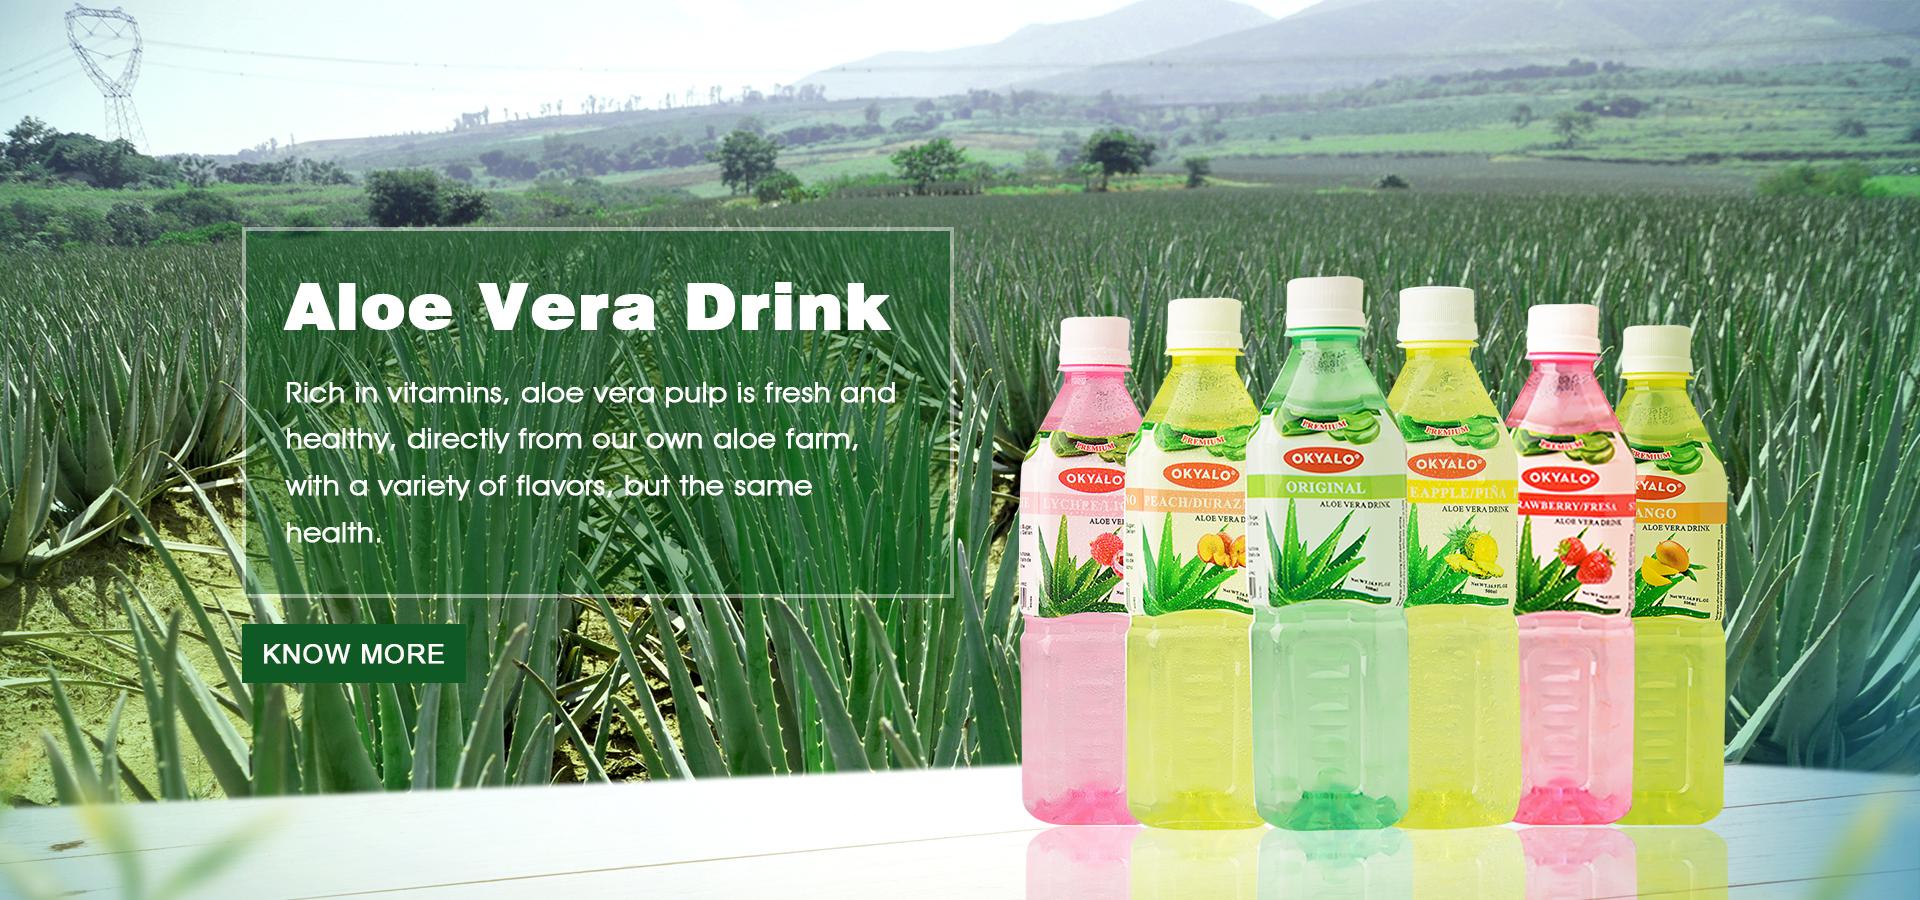 Wholesale Aloe Vera Drink